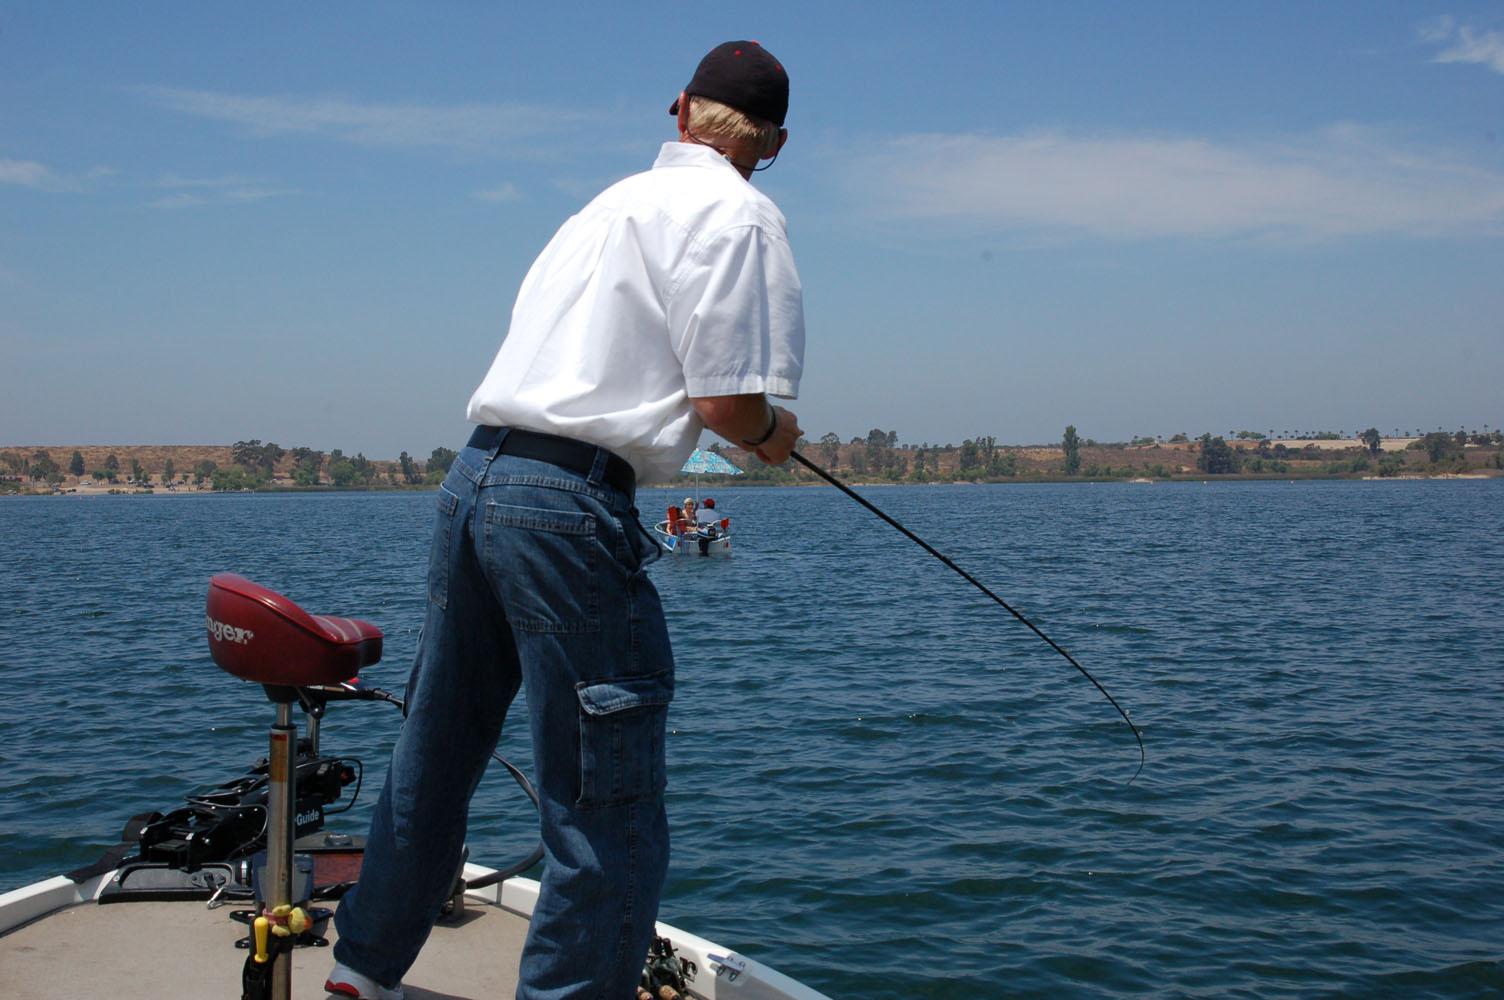 Otay the key to san diego team open kramer gone fishing for Otay lakes fishing